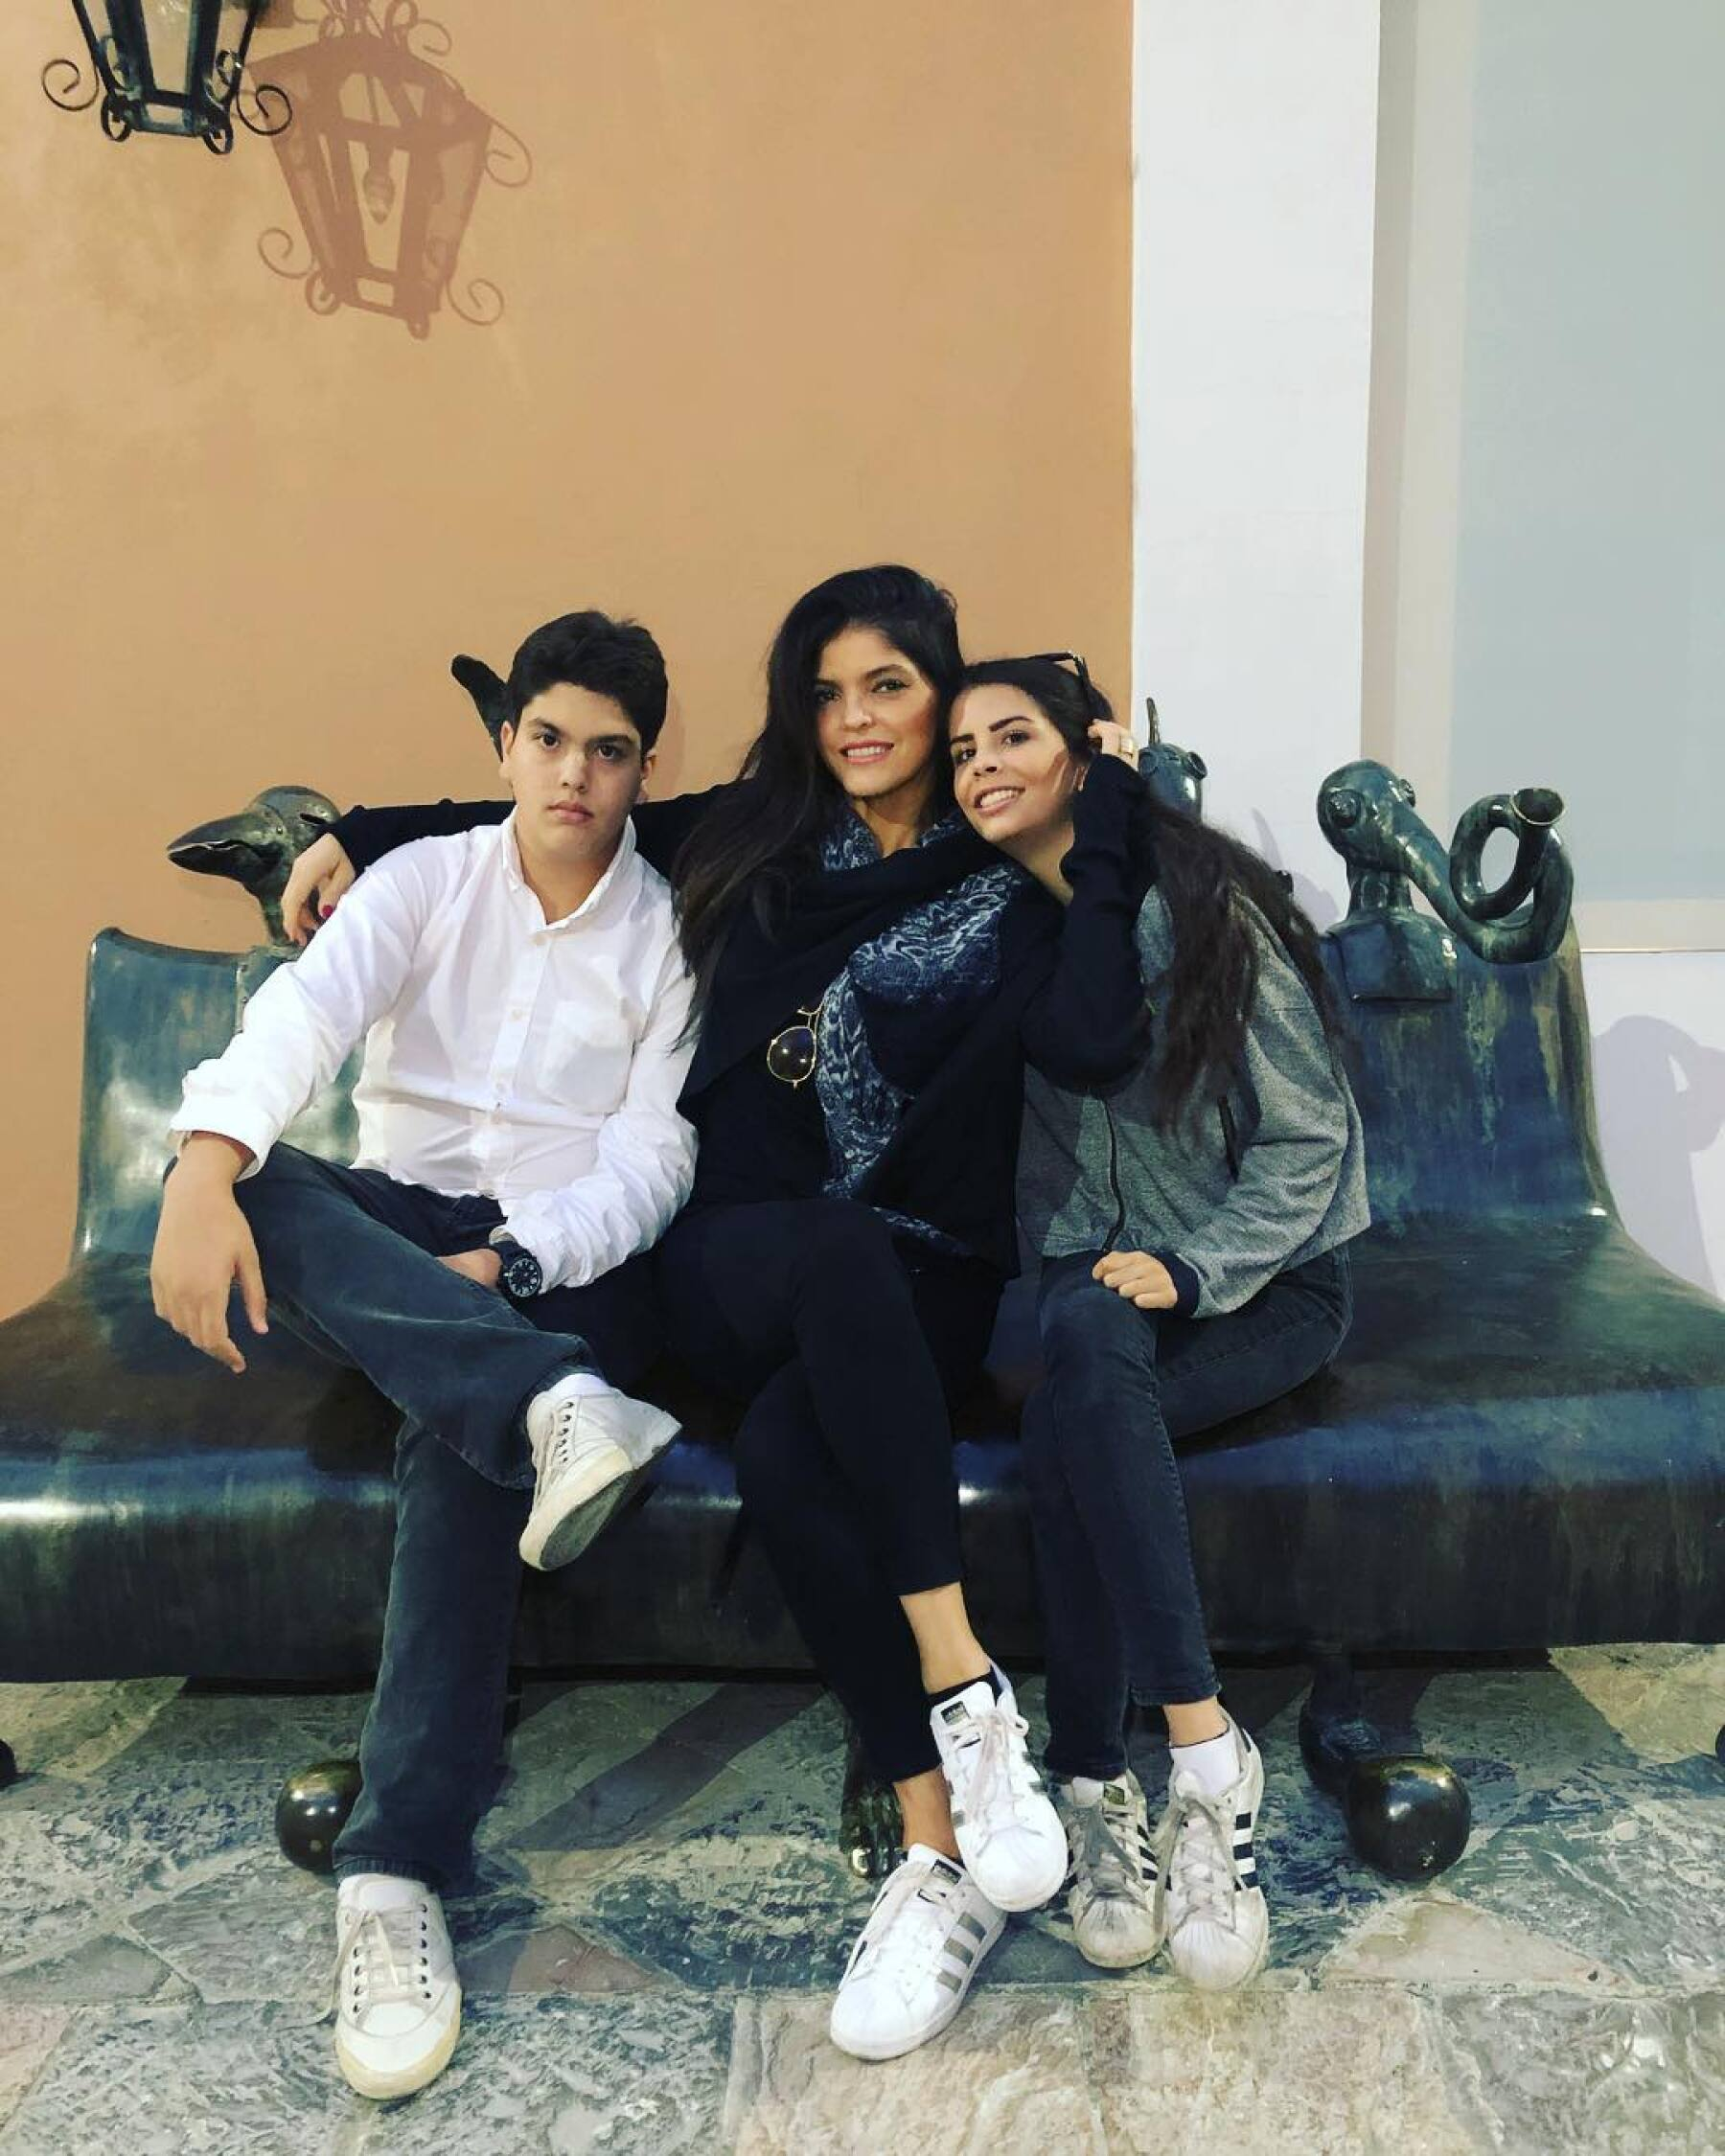 José Emilio Fernández, Ana Bárbara y Paula Fernández